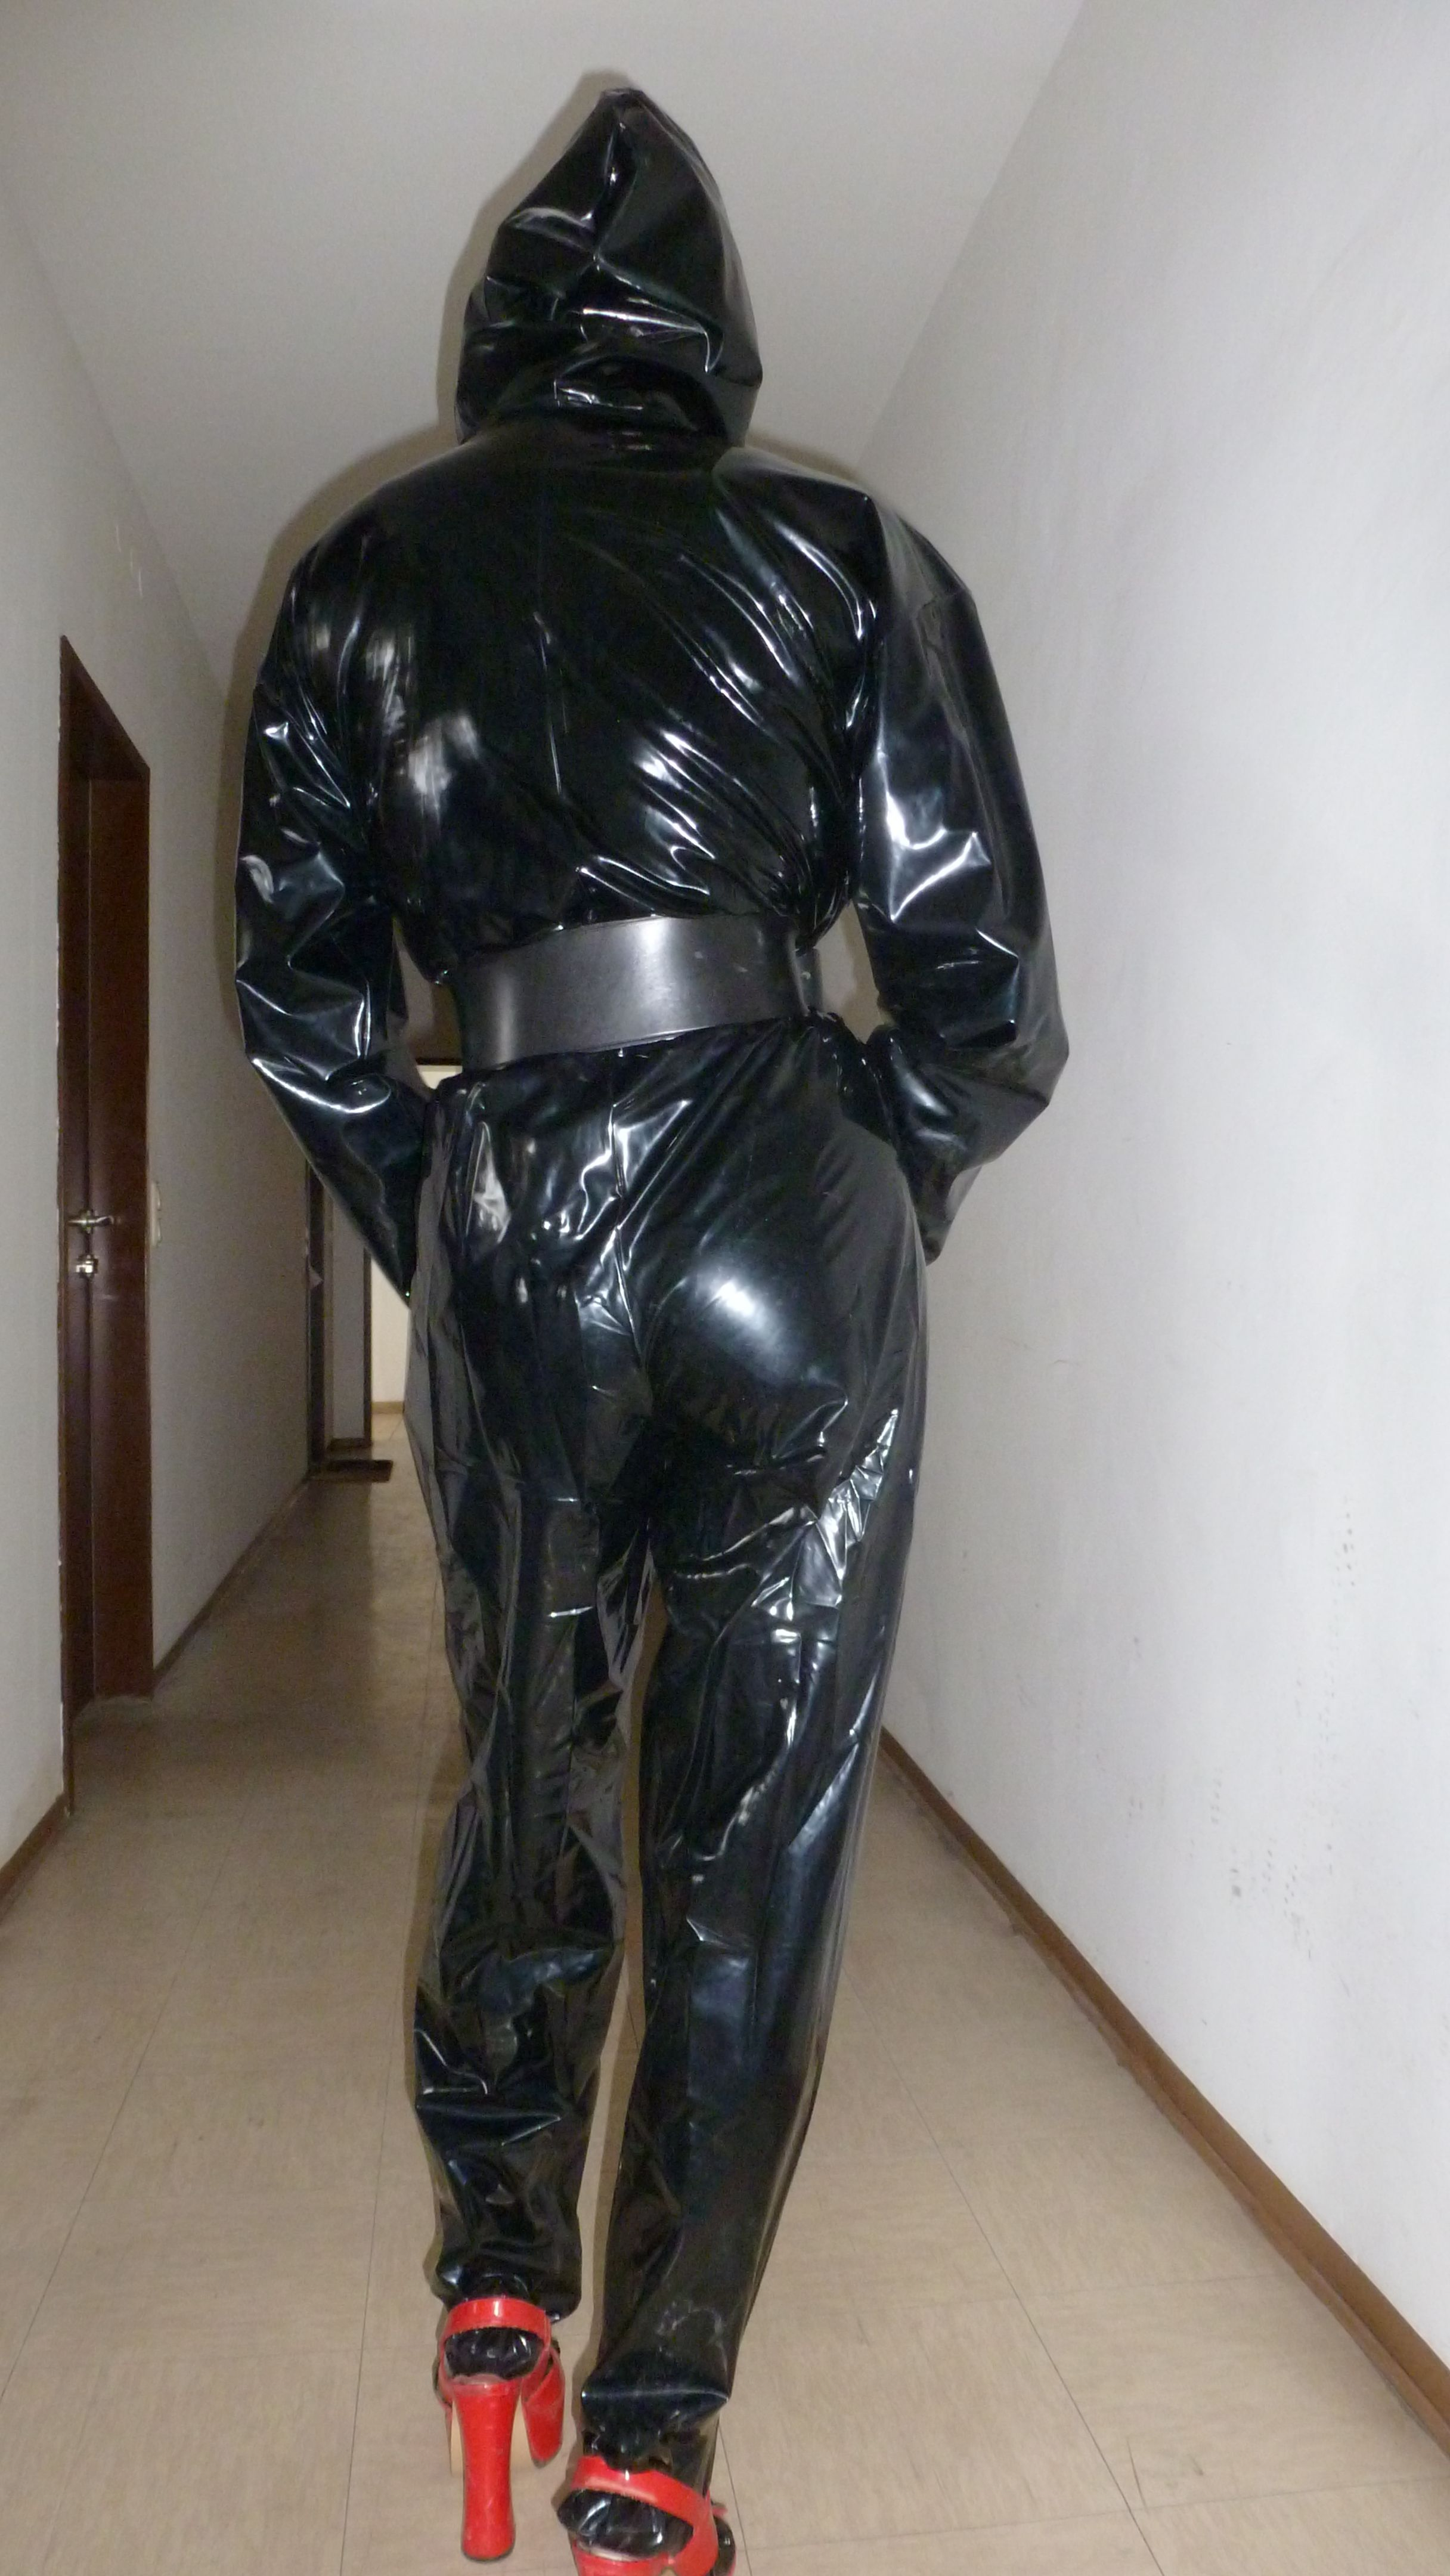 pvc-overall   eigene   Pvc raincoat, Leather Pants und ...